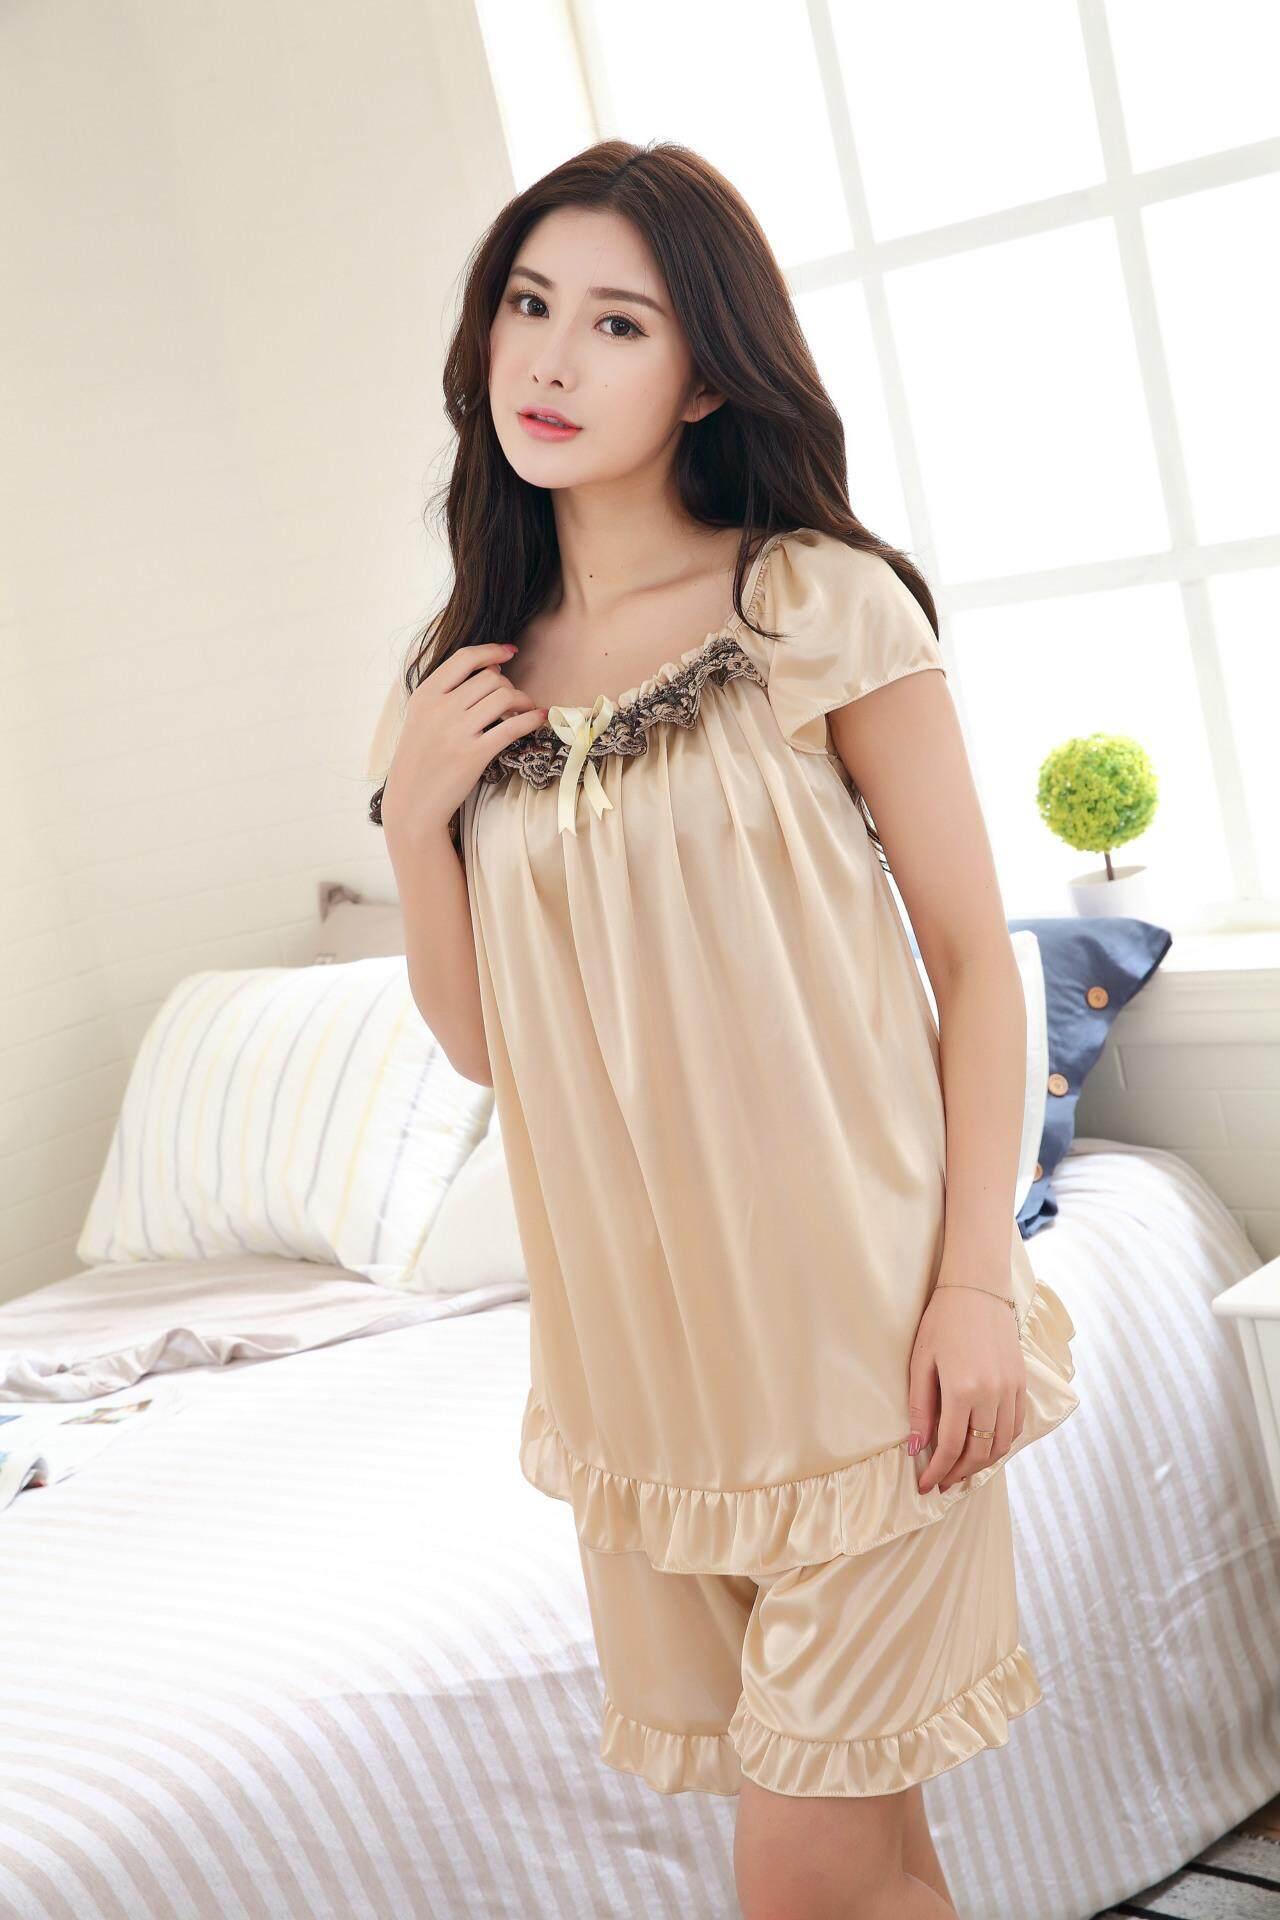 Bolster Store Sexy Lingerie Women Ladies Sleepwear Satin Silk Pajamas Baju Tidur Set of 2 Blouse + Pants